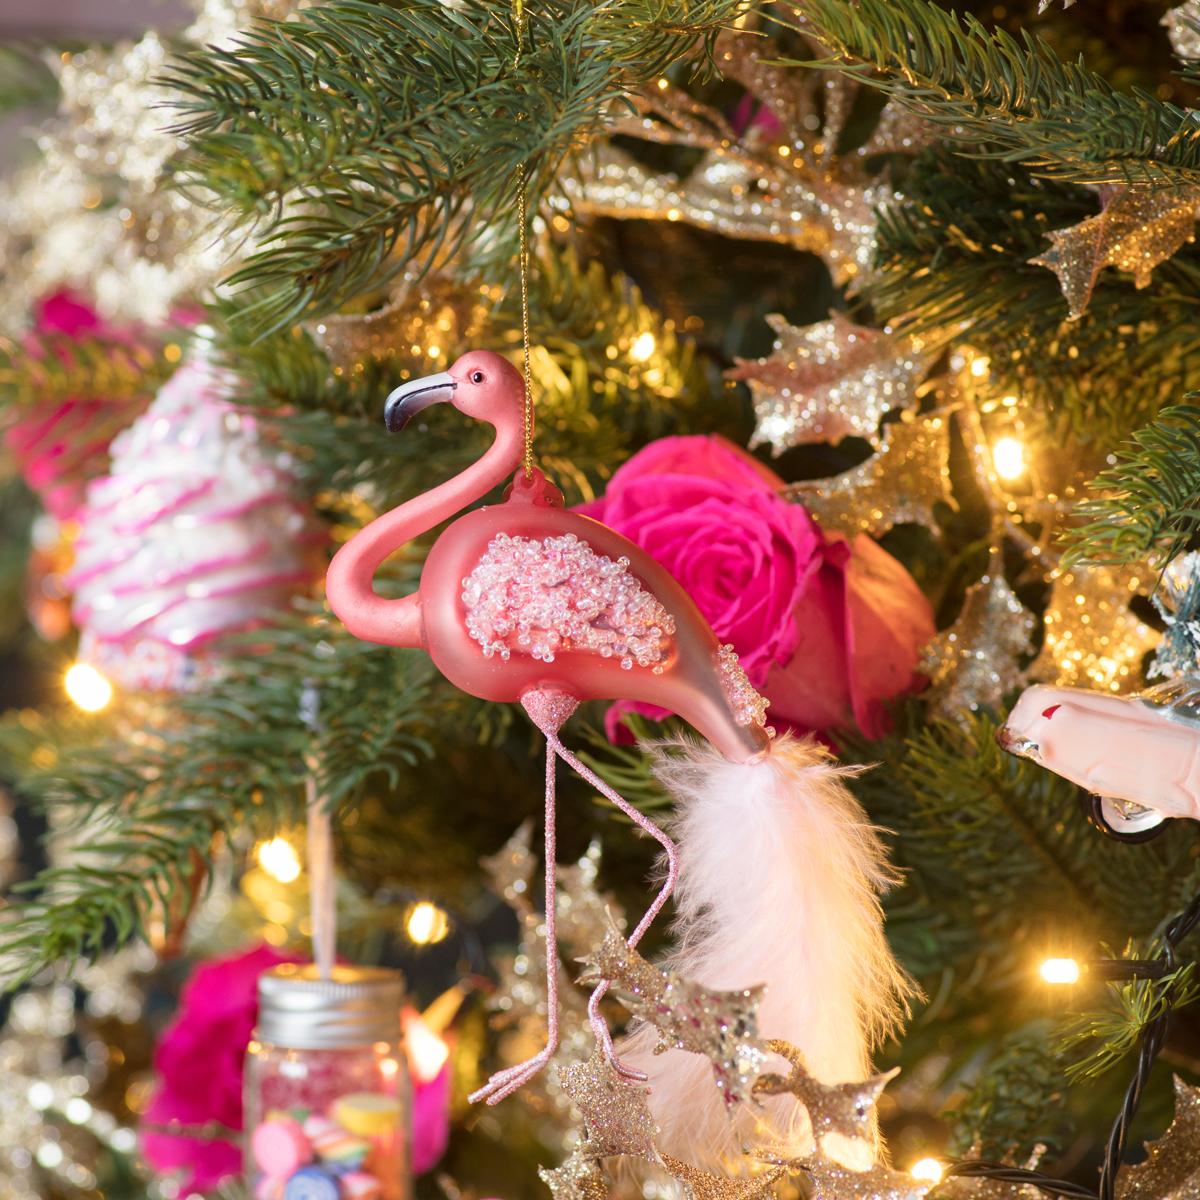 Flamingo Christmas tree decoration from Amara